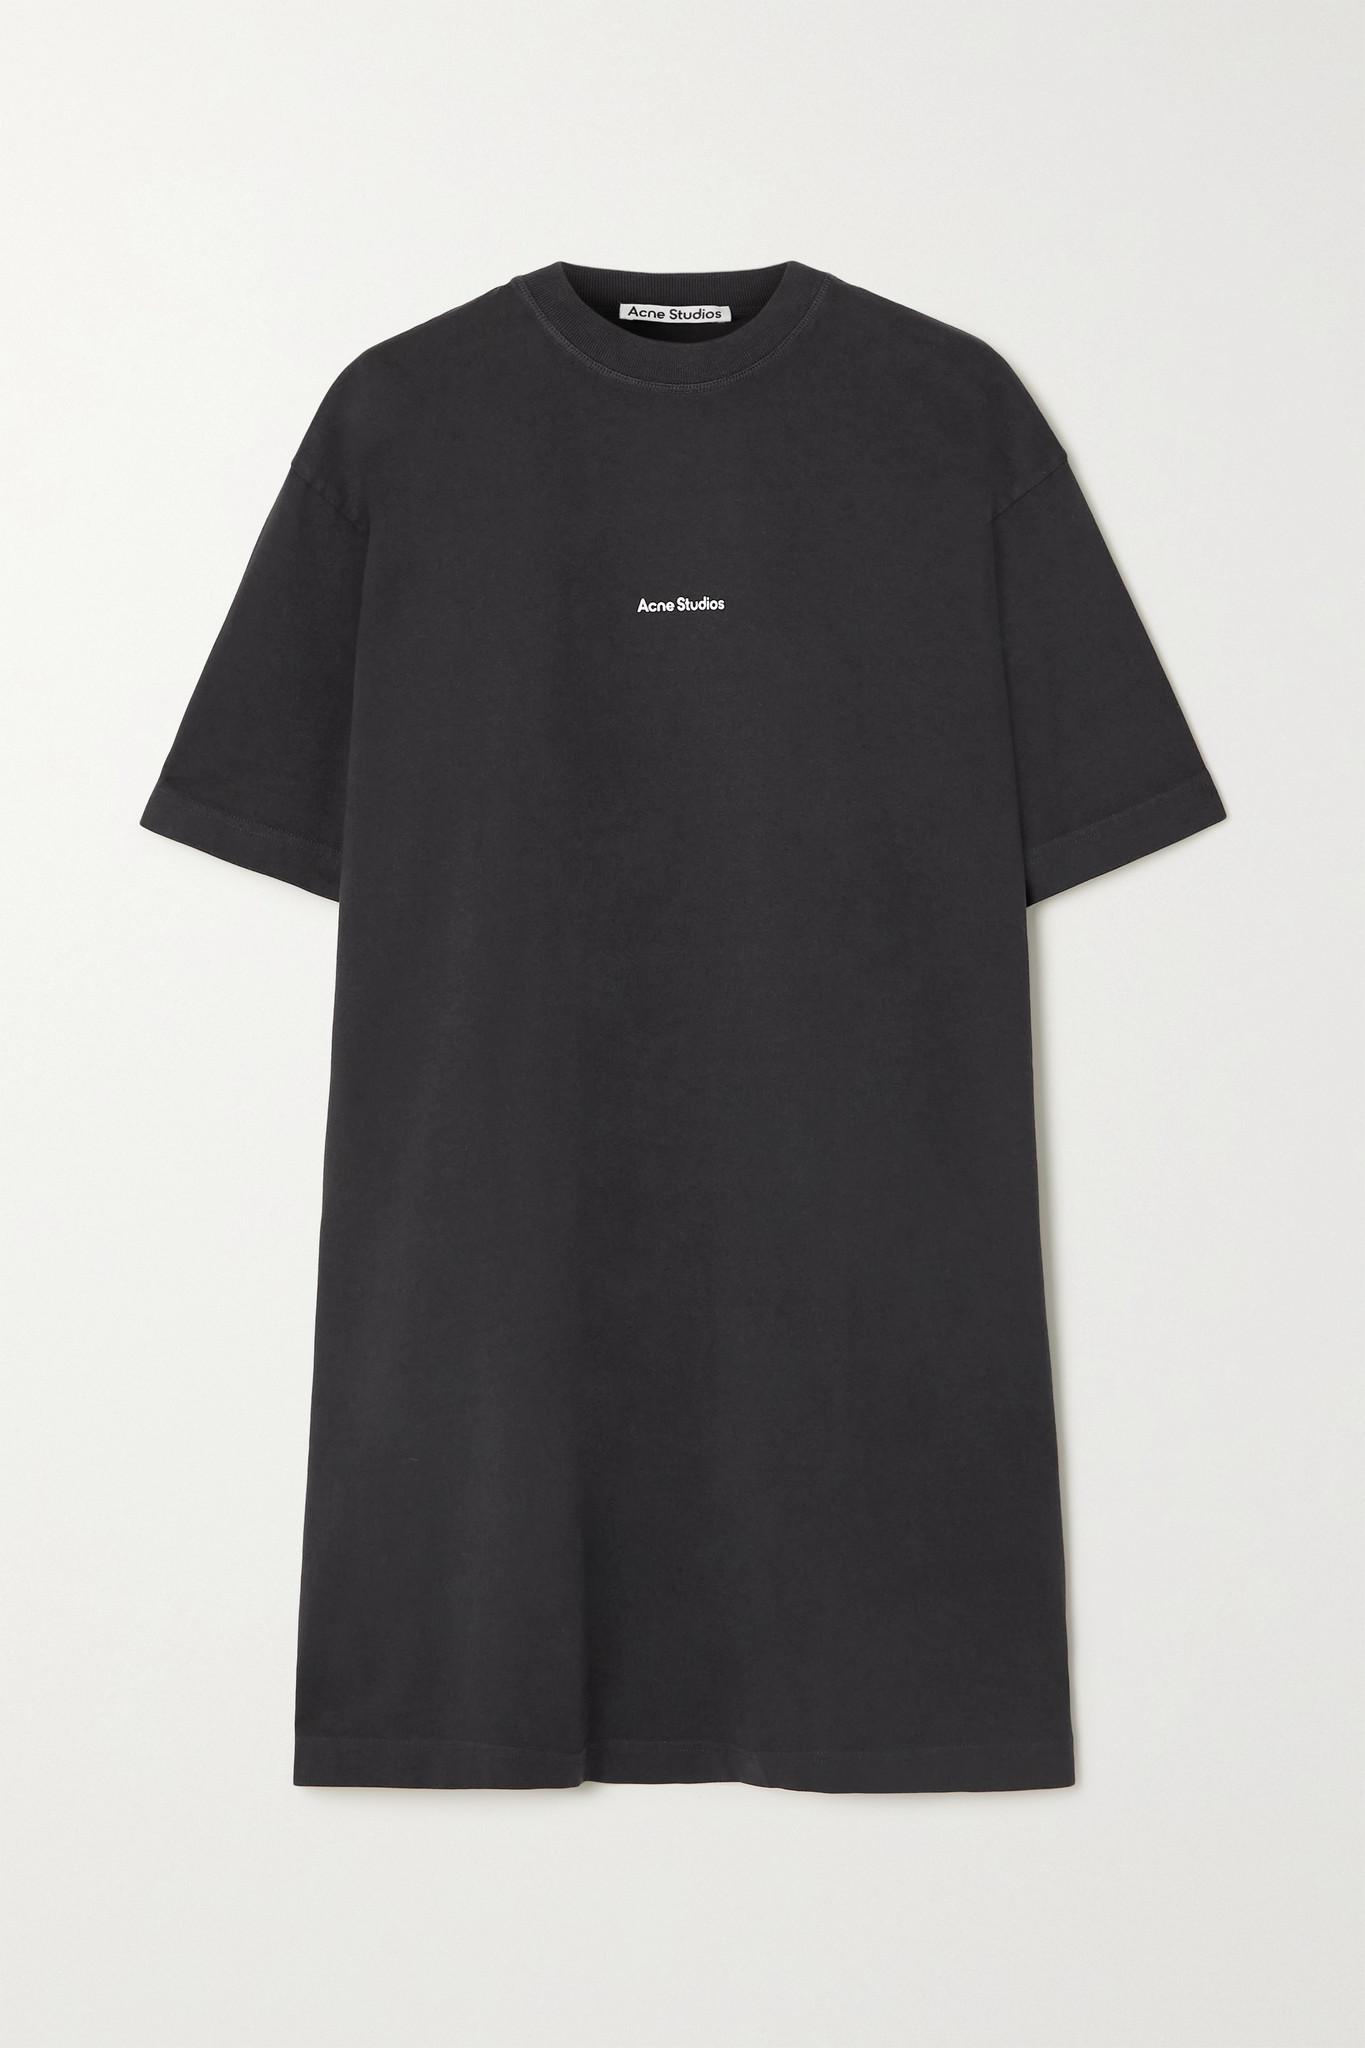 ACNE STUDIOS - + Net Sustain Printed Organic Cotton-jersey Mini Dress - Black - medium